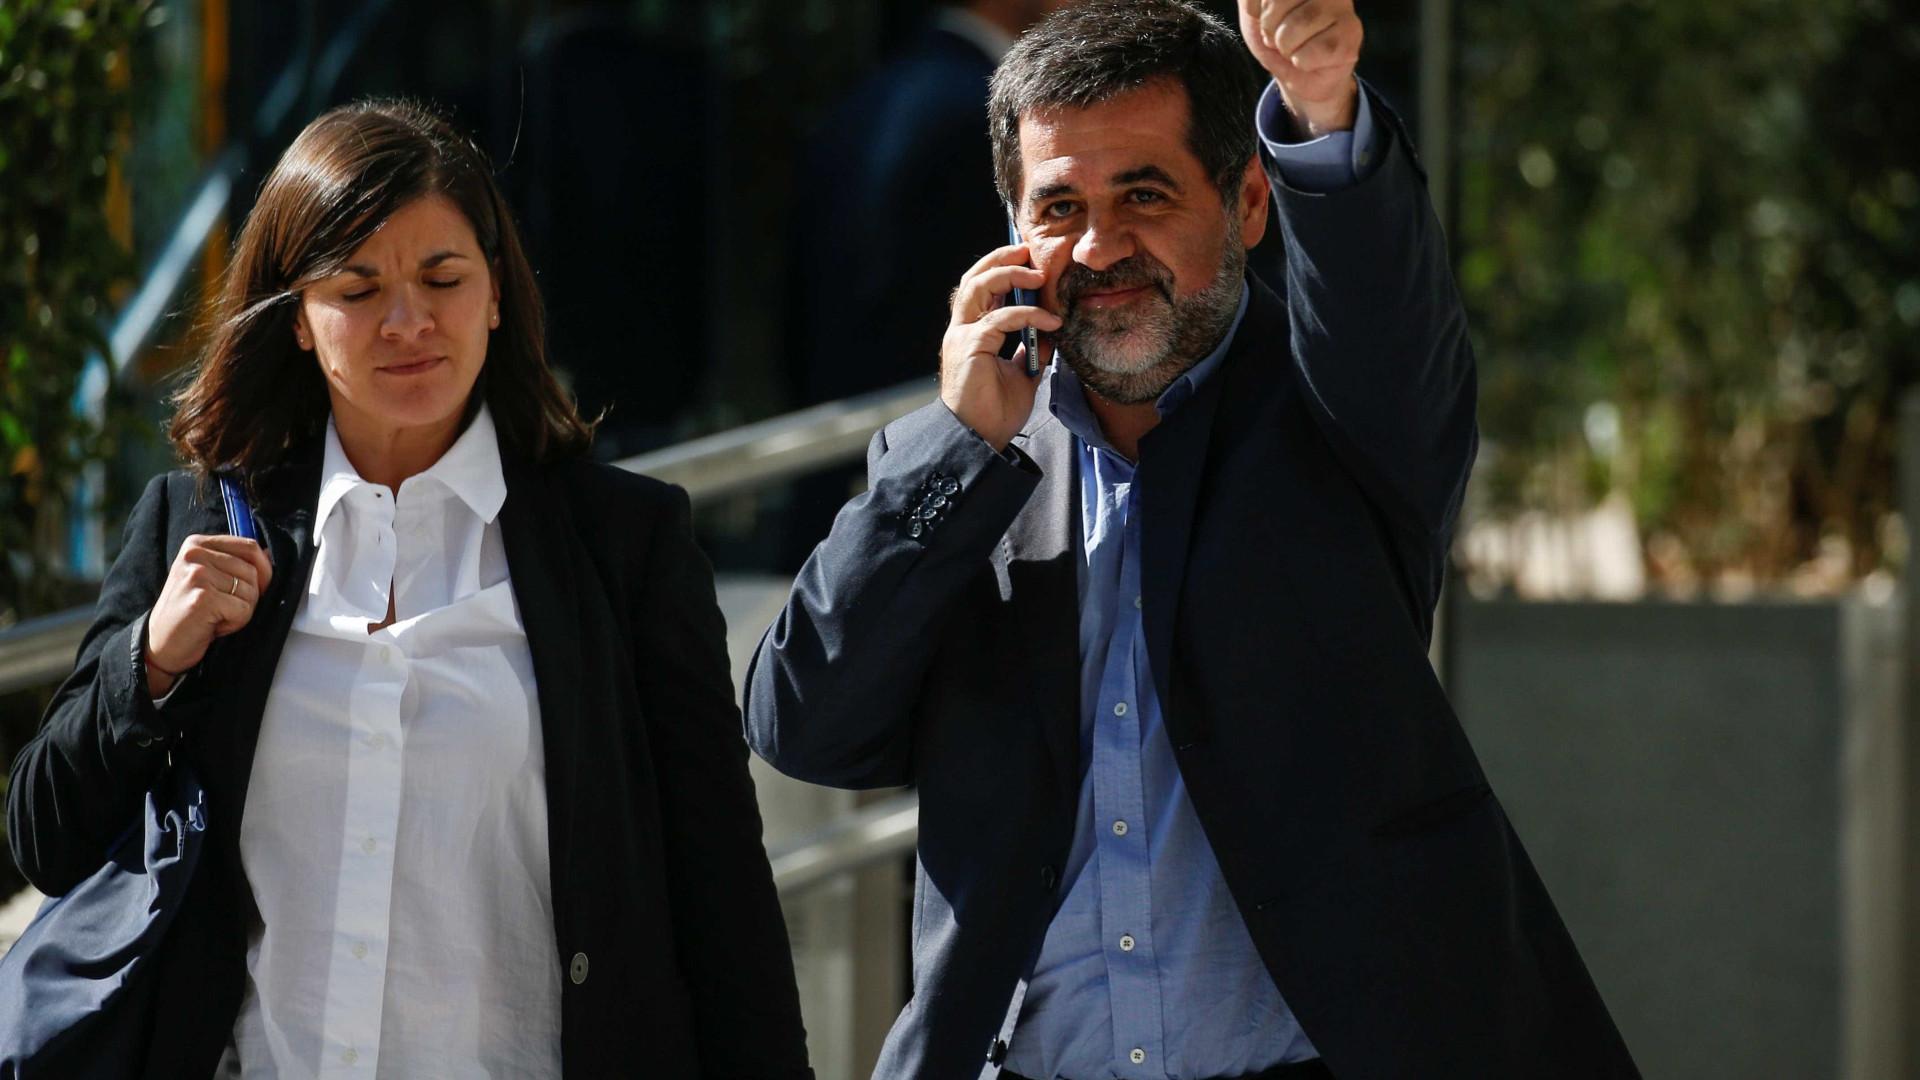 Candidato independentista detido renuncia à candidatura